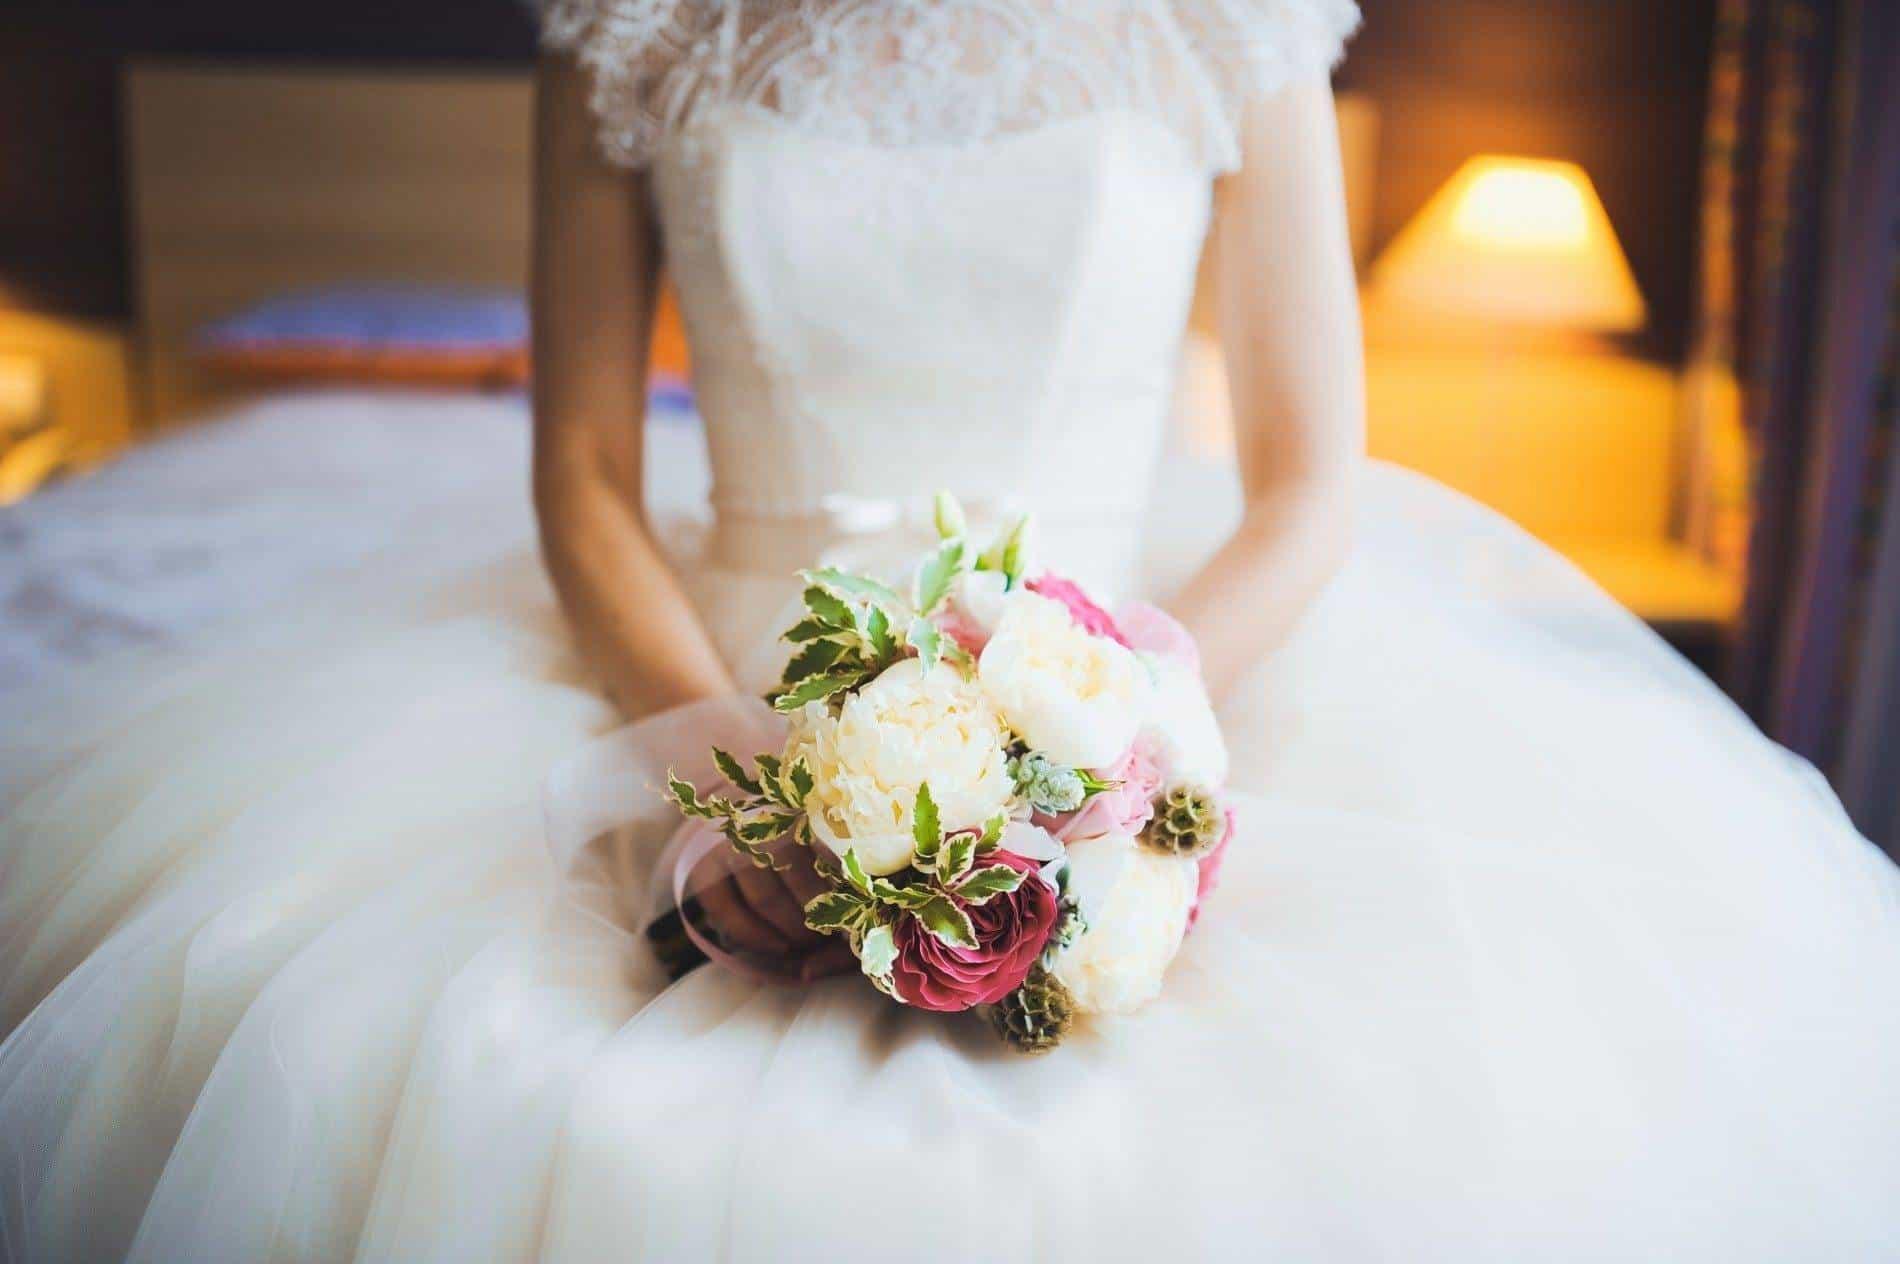 5. Unforgettable emotions e1454928868720 - Luxury Wedding Gallery